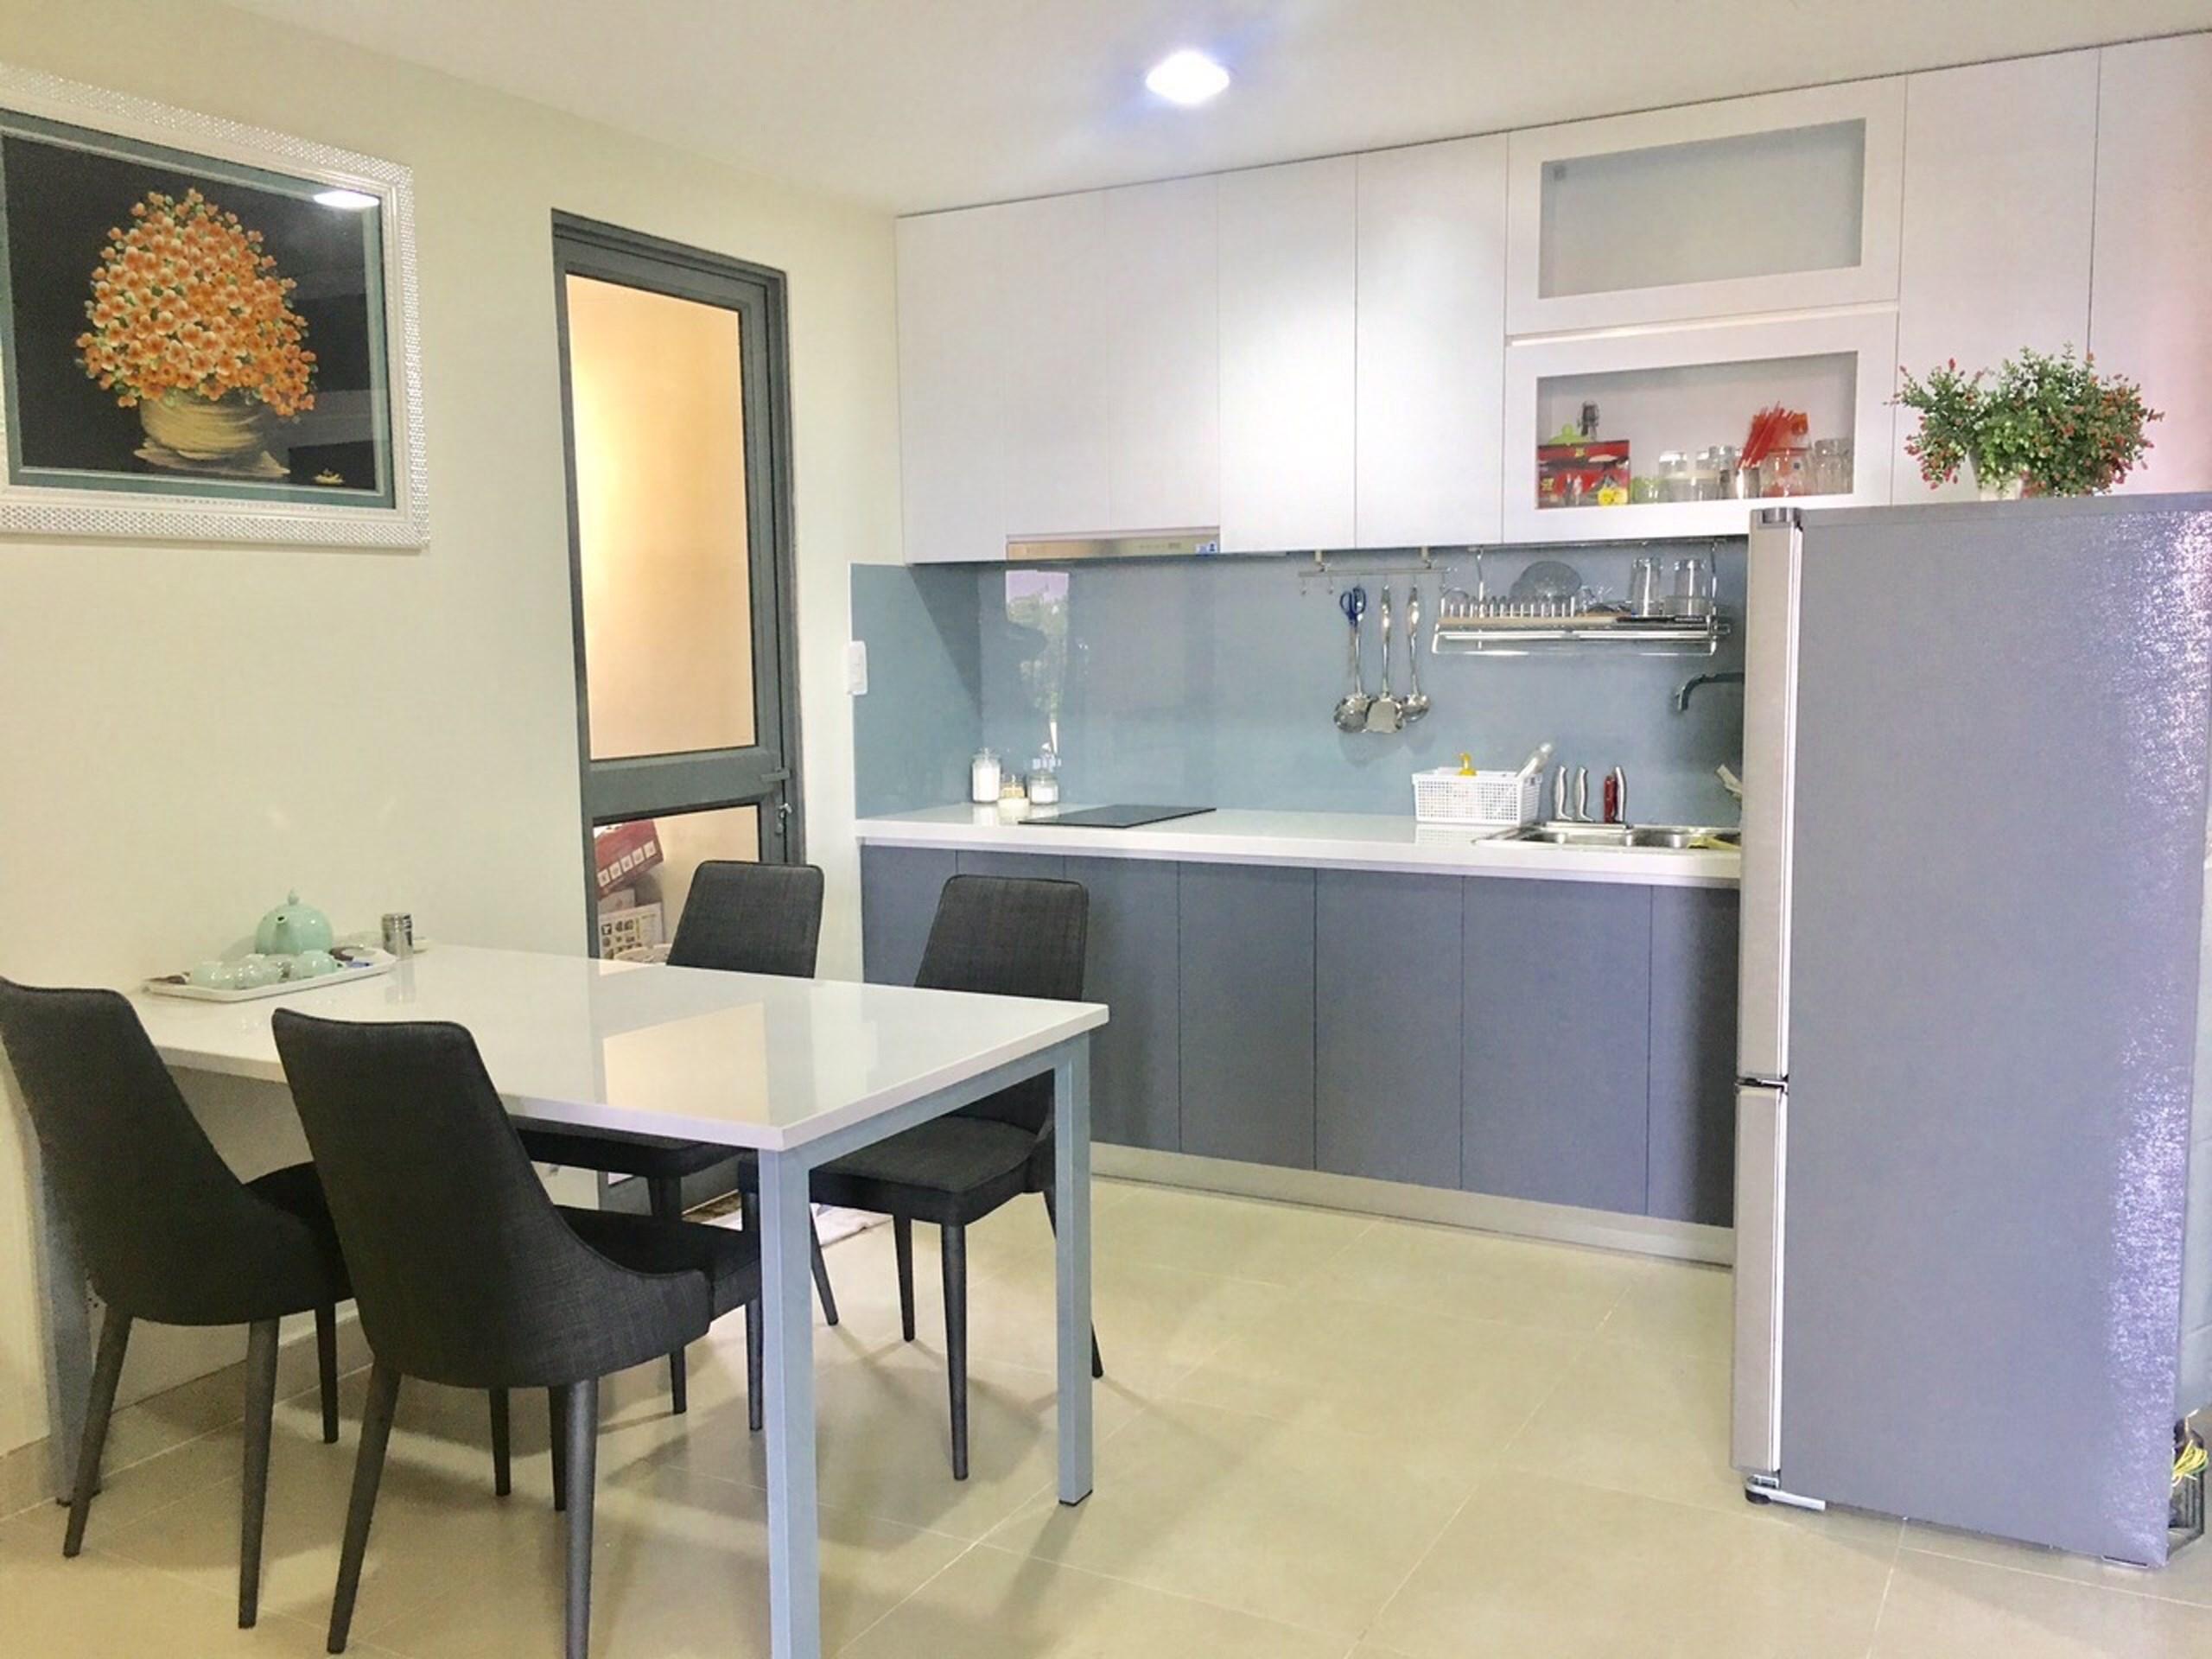 MTD95540 - Masteri Thao Dien Apartment For Rent - Best Price For Long-term - 1 bedroom